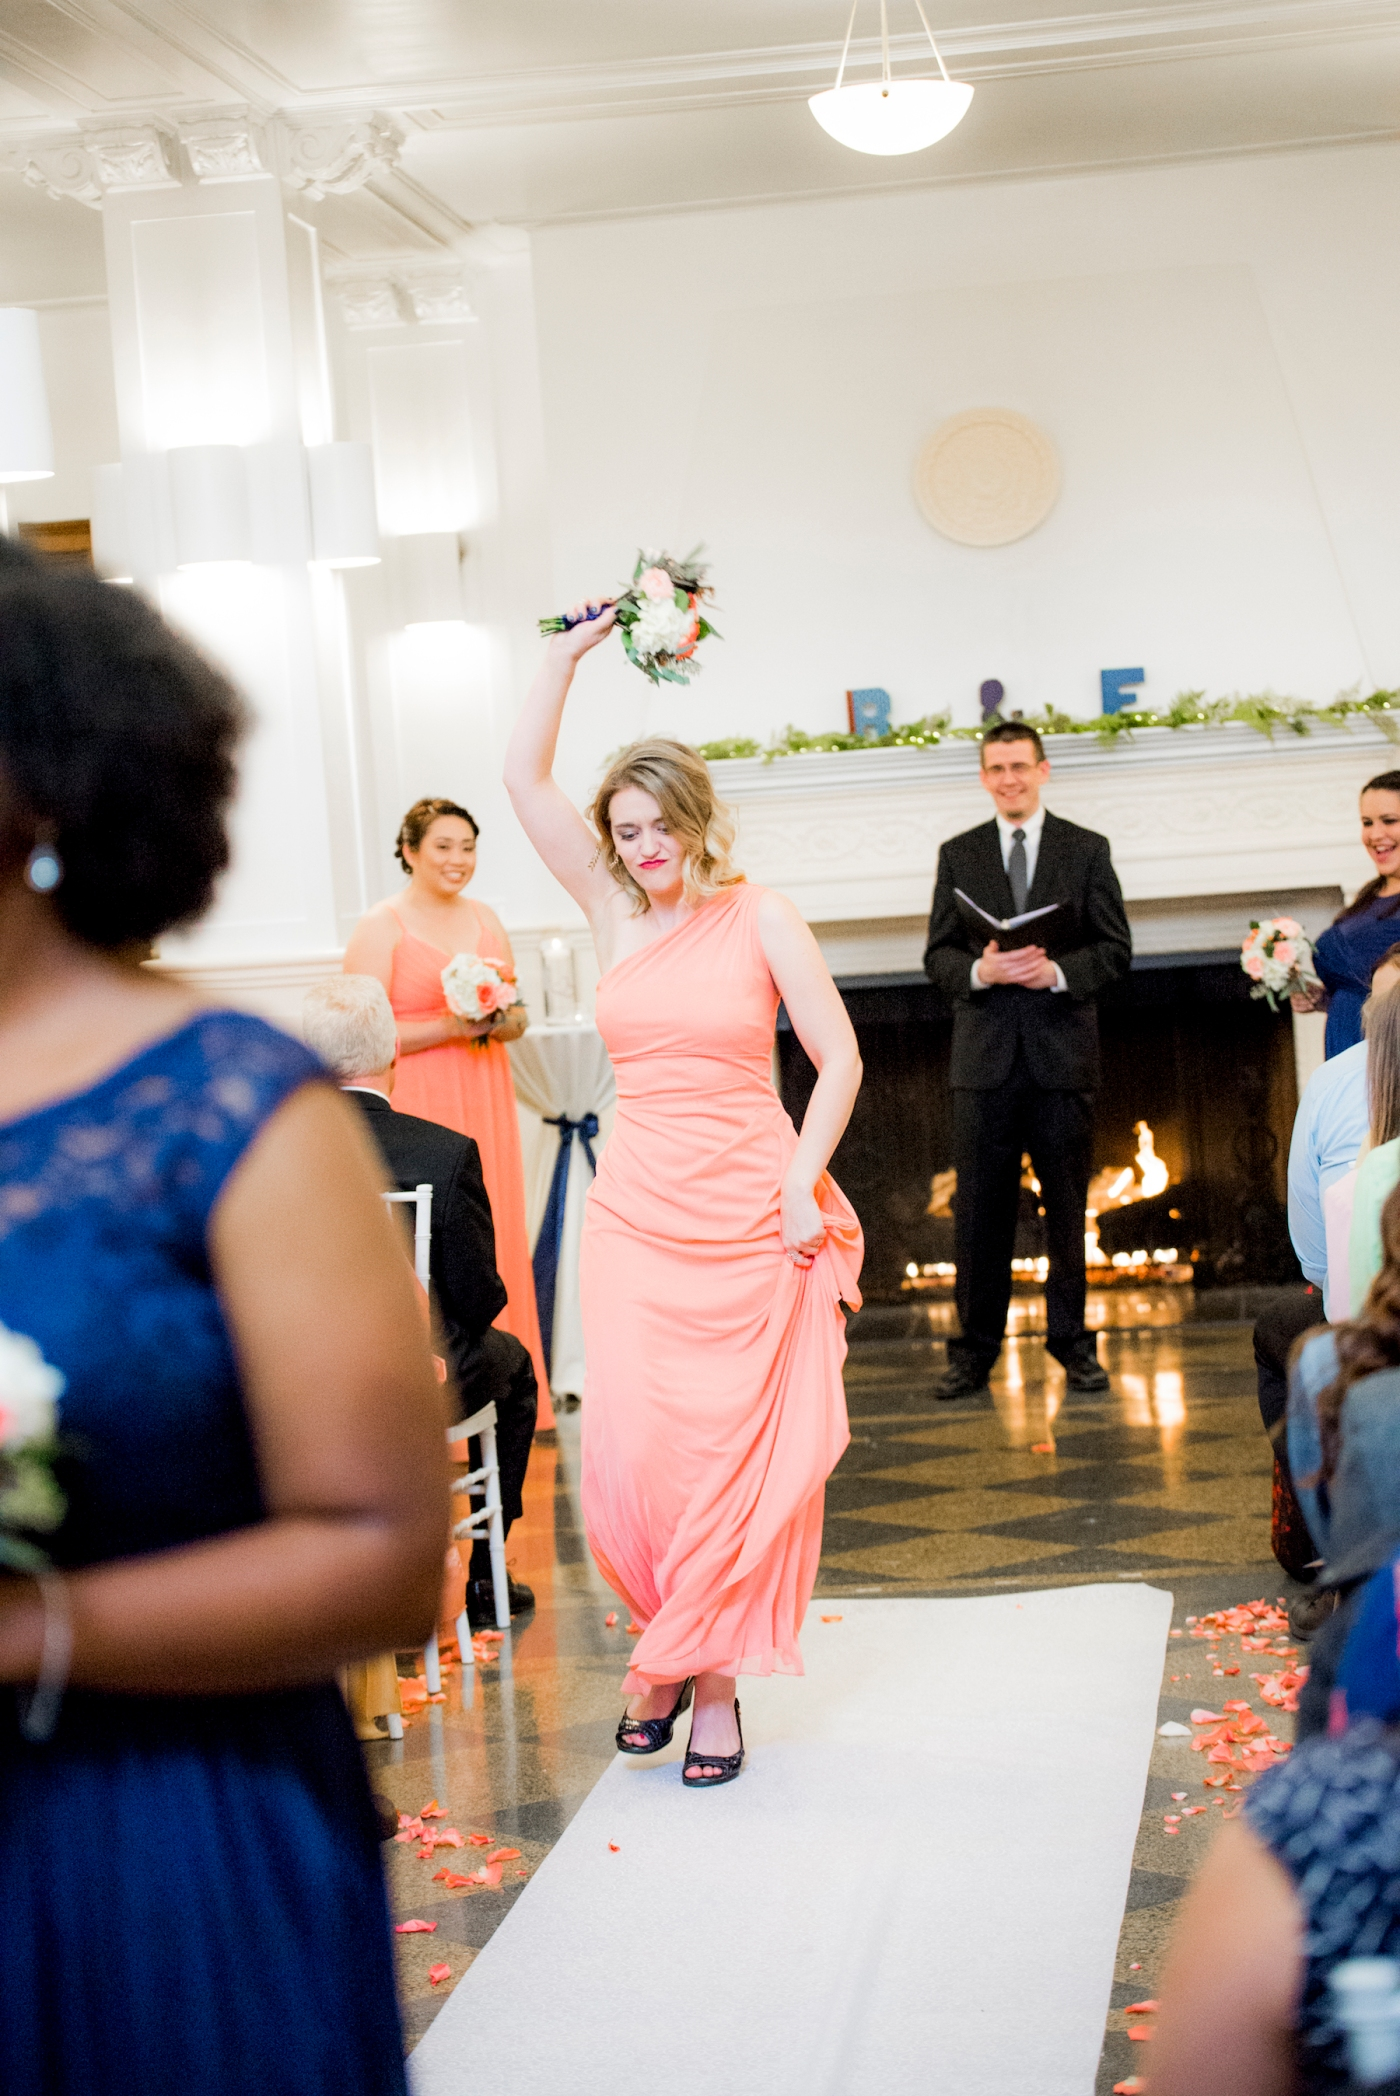 DSC_2757Everett_Wedding_Ballroom_Jane_Speleers_photography_Rachel_and_Edmund_Ceremony_2017